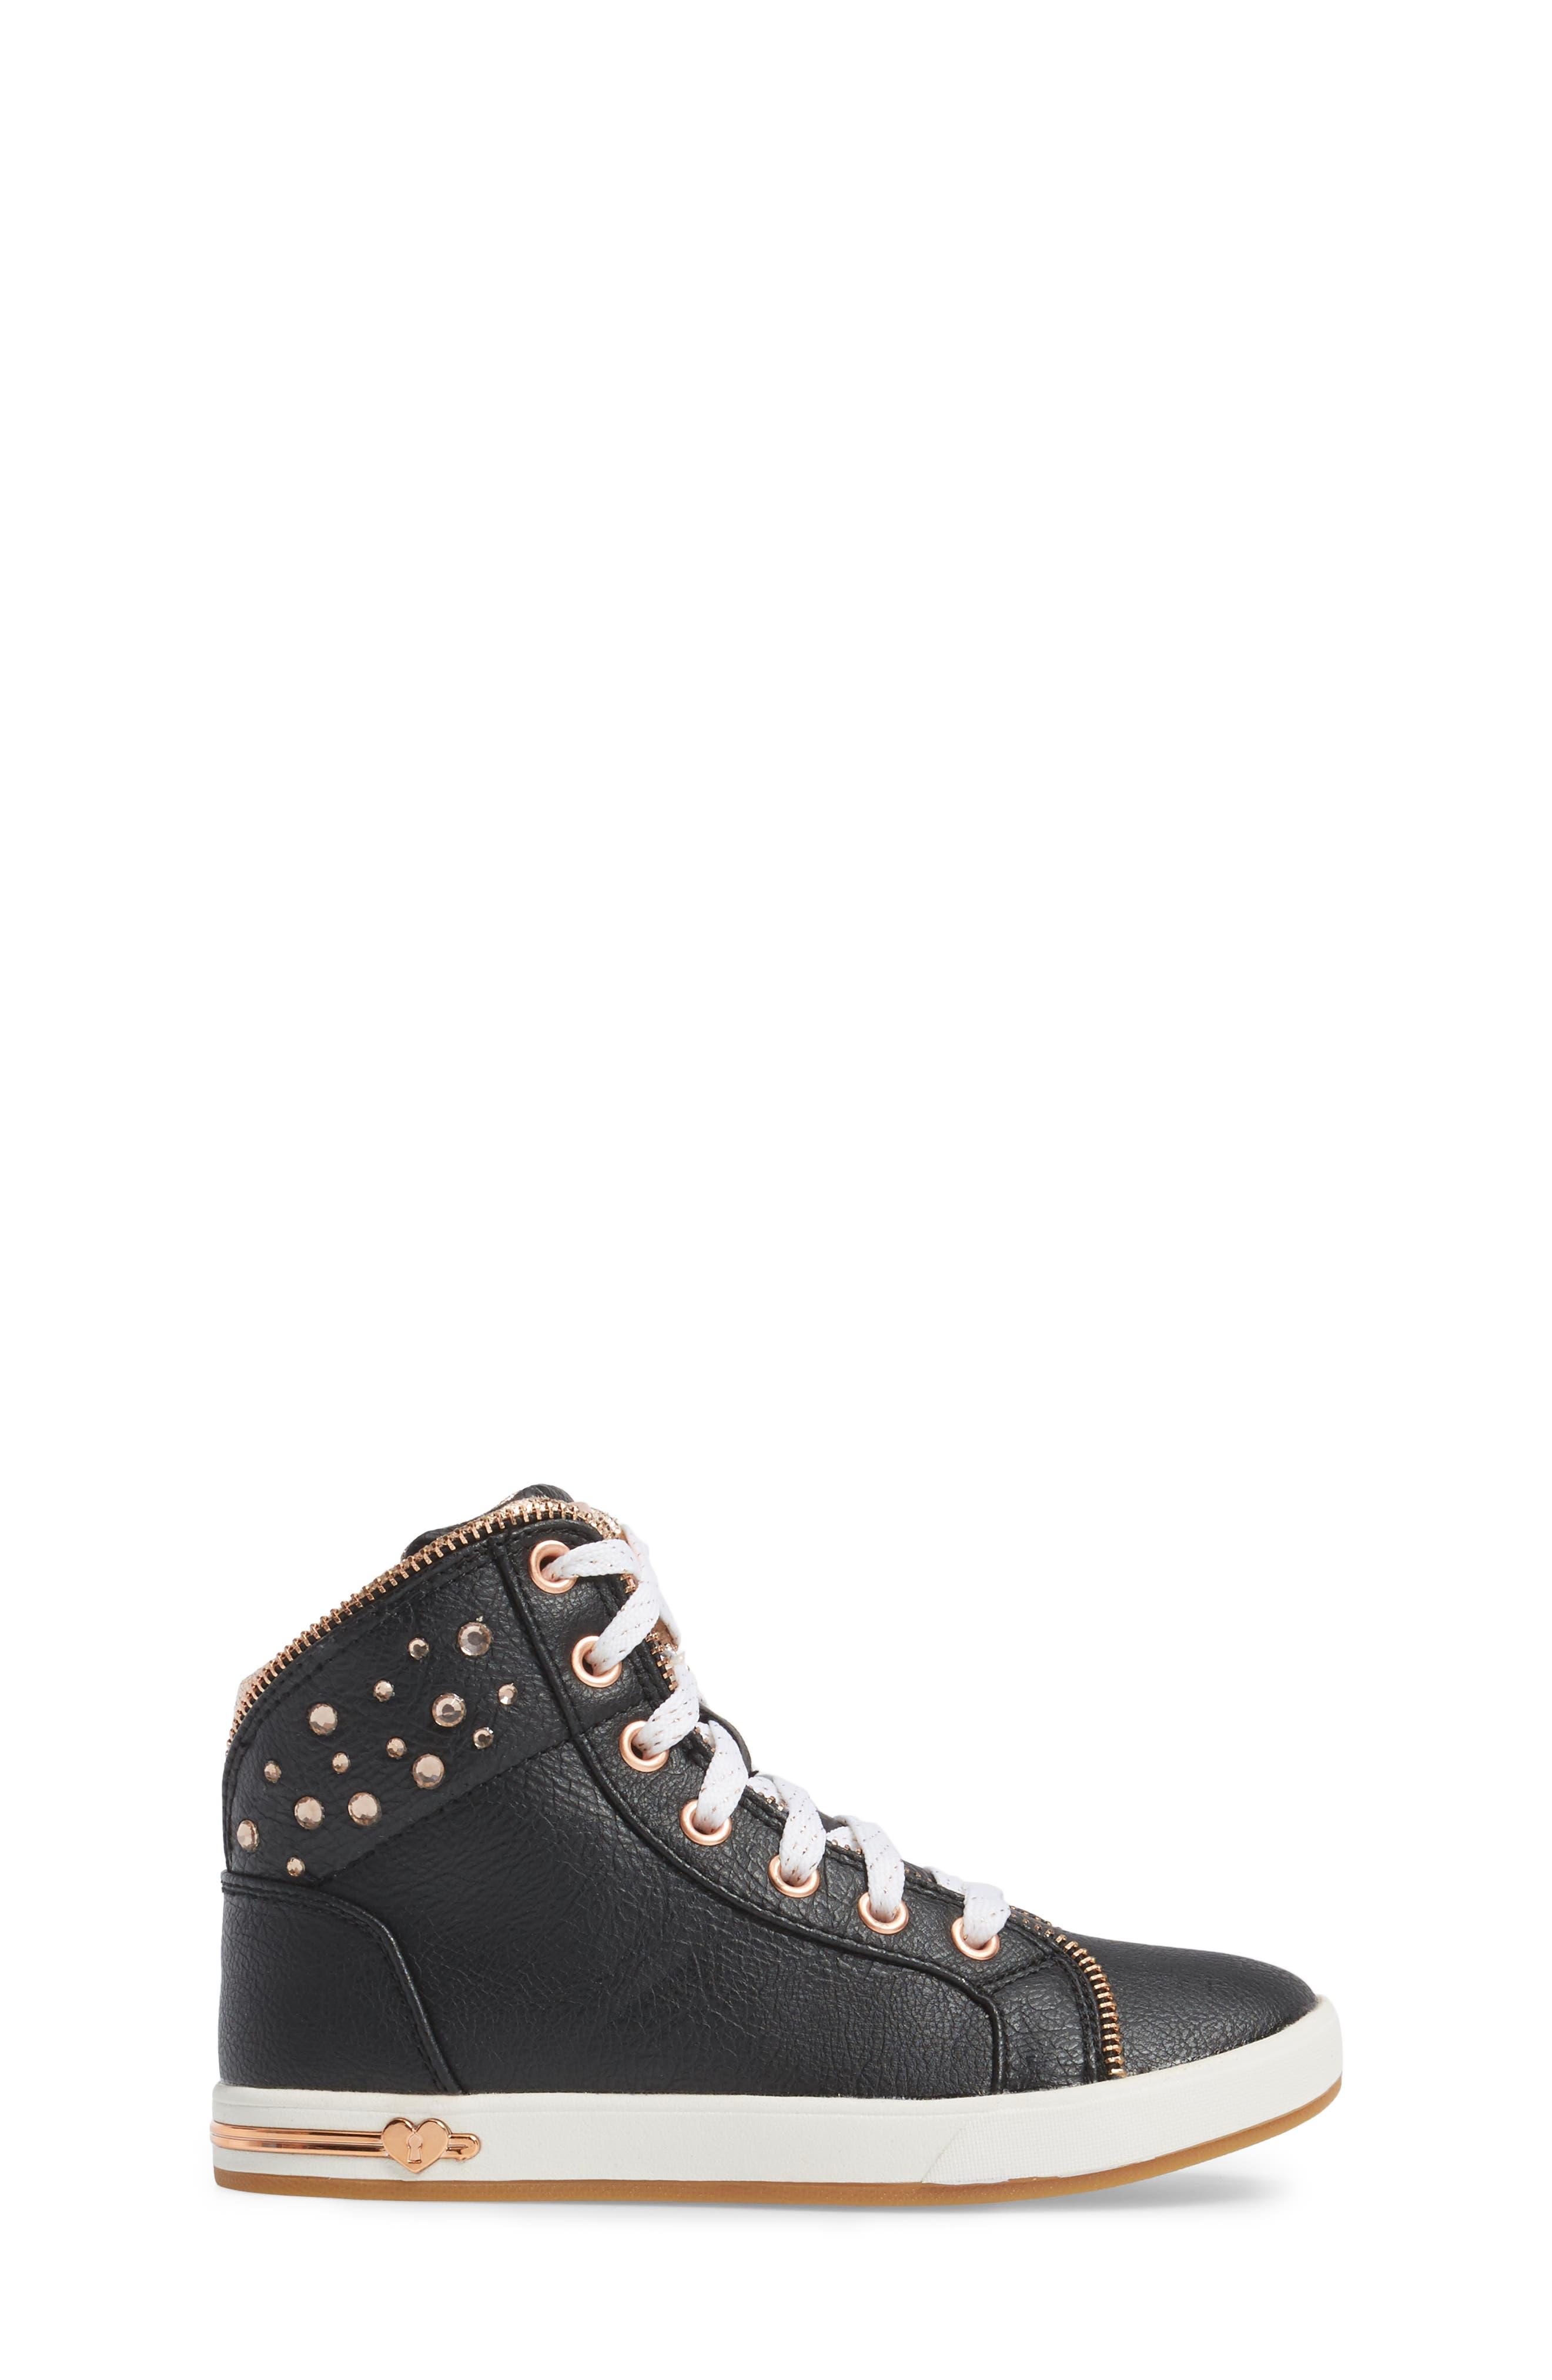 Shoutouts Embellished High Top Sneaker,                             Alternate thumbnail 3, color,                             Black/ Rose Gold